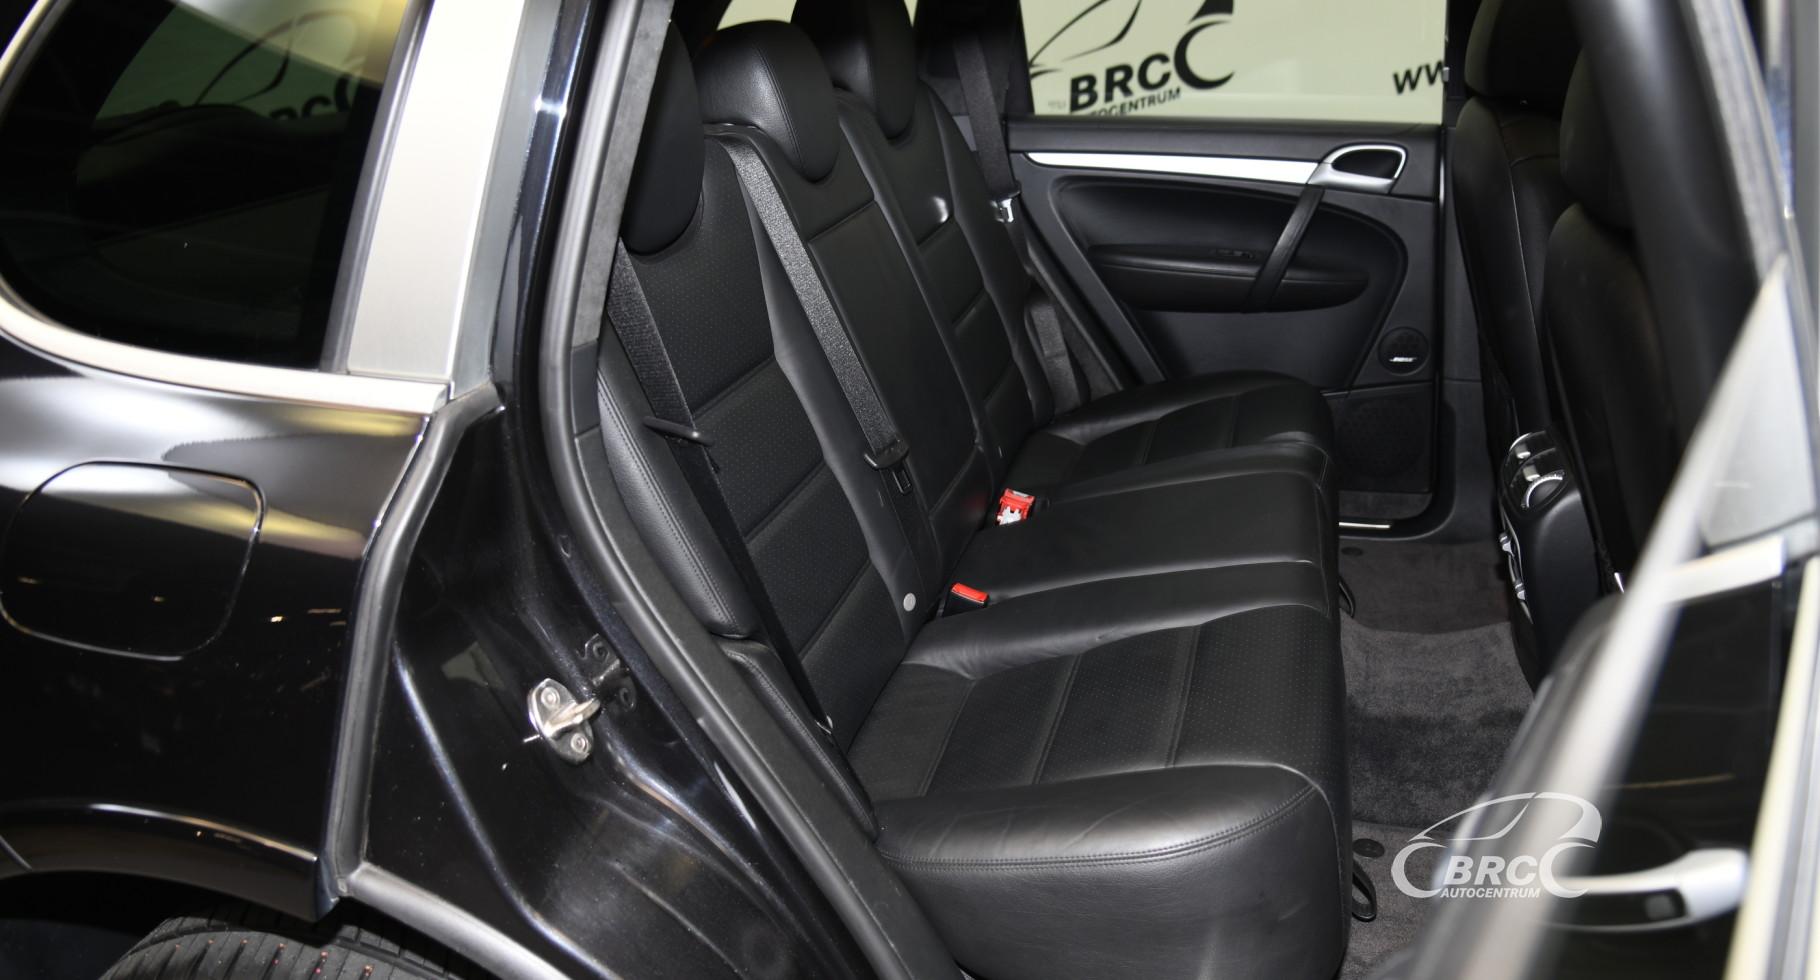 Porsche Cayenne Turbo 4.8 V8 Automatas